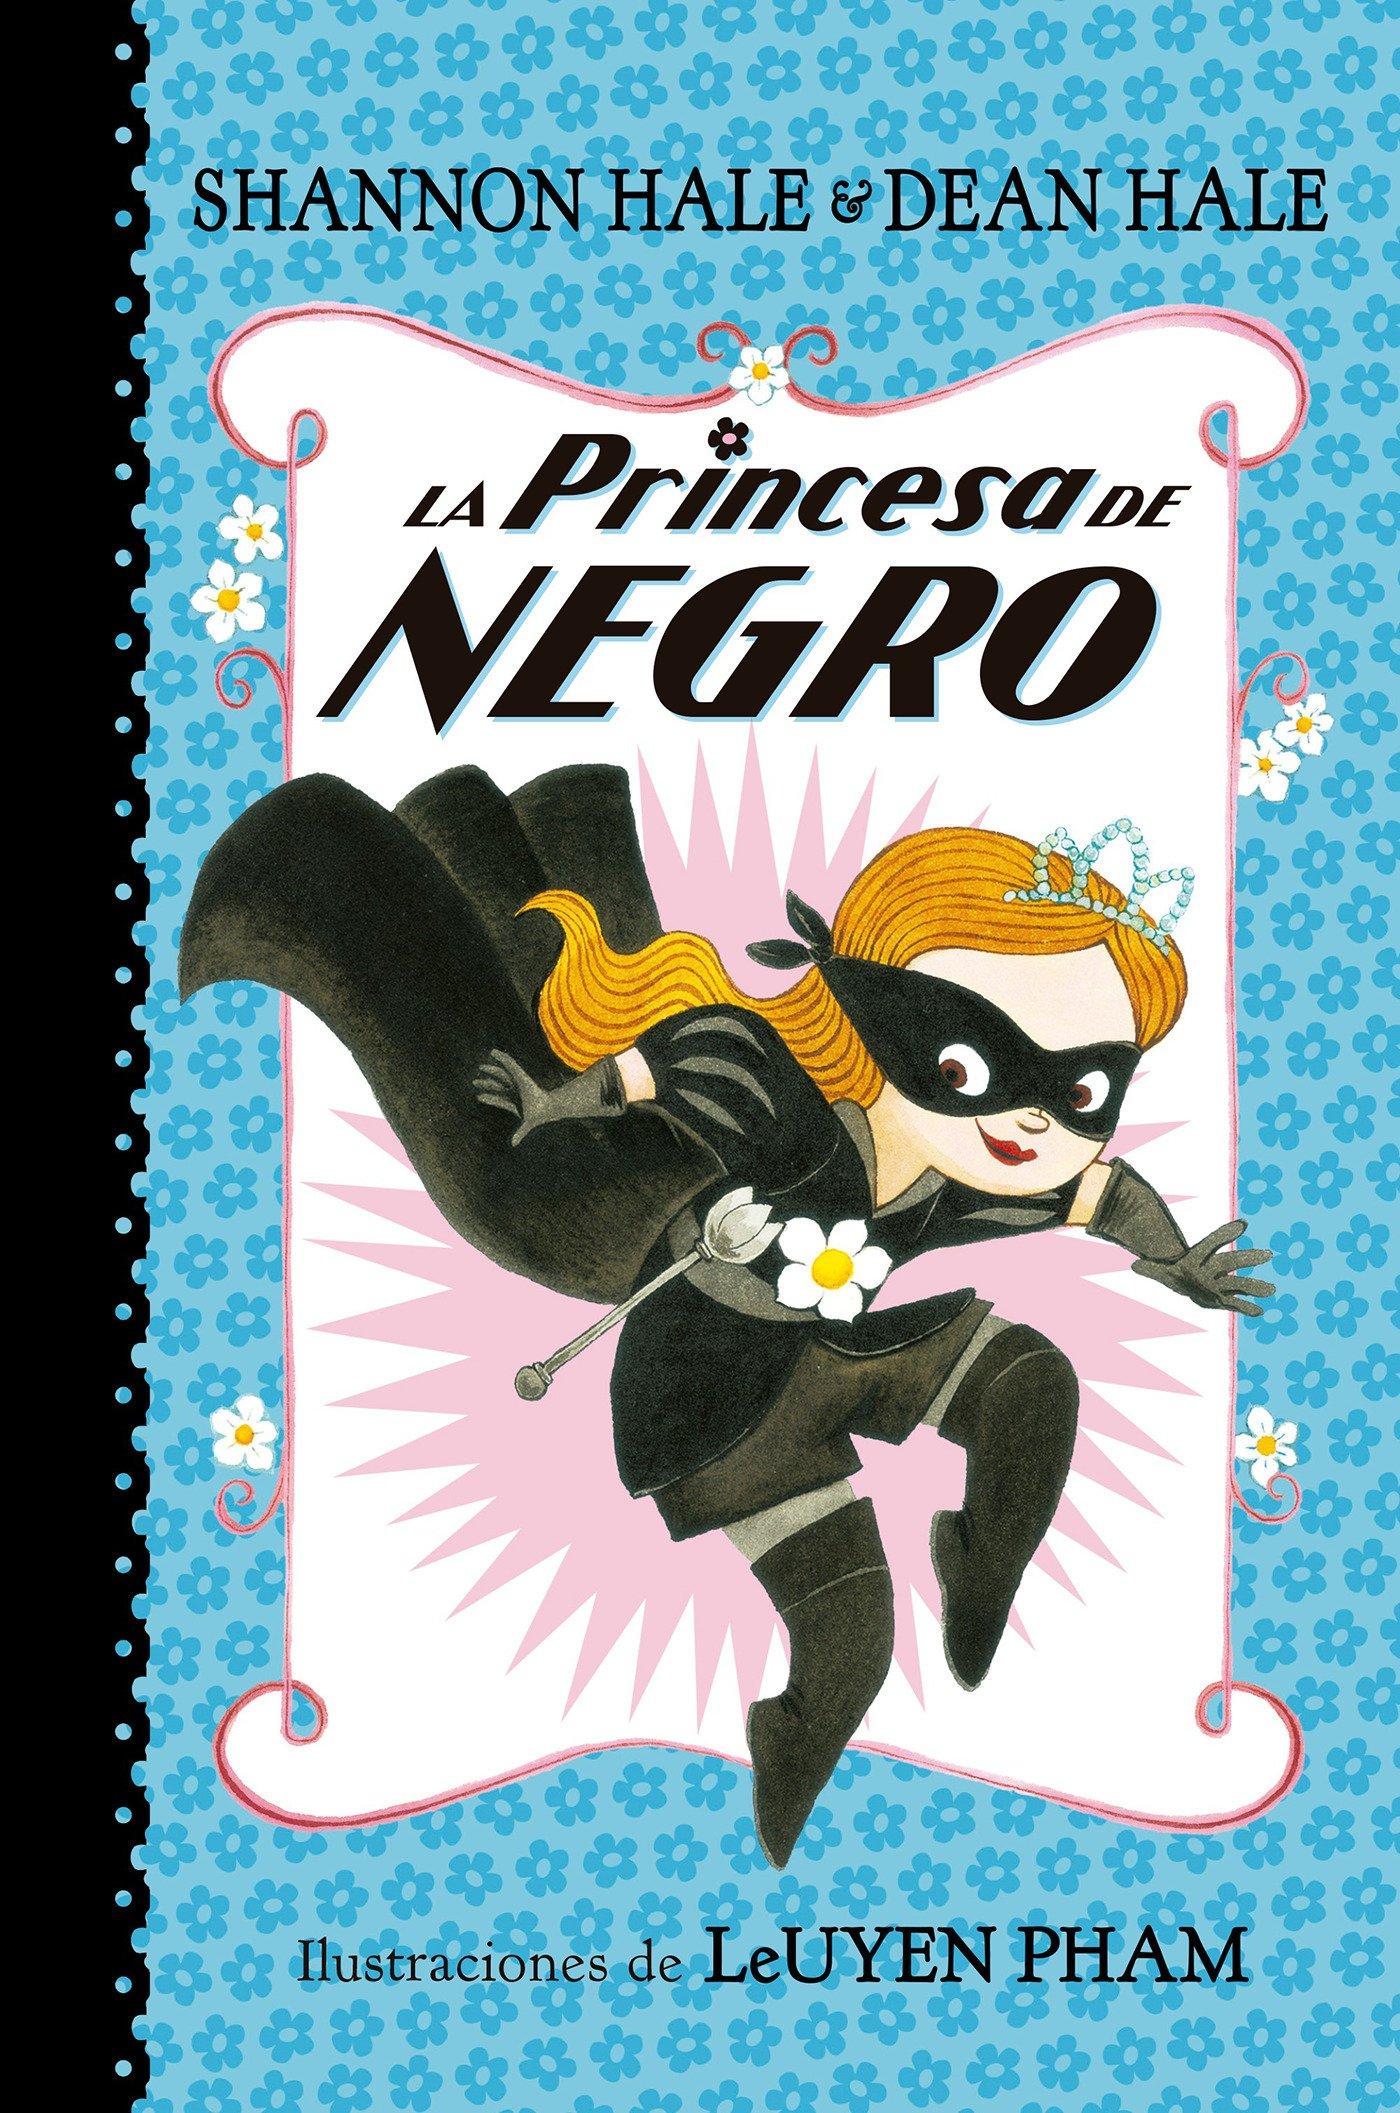 Download La Princesa de Negro /The Princess in Black (Spanish Edition) pdf